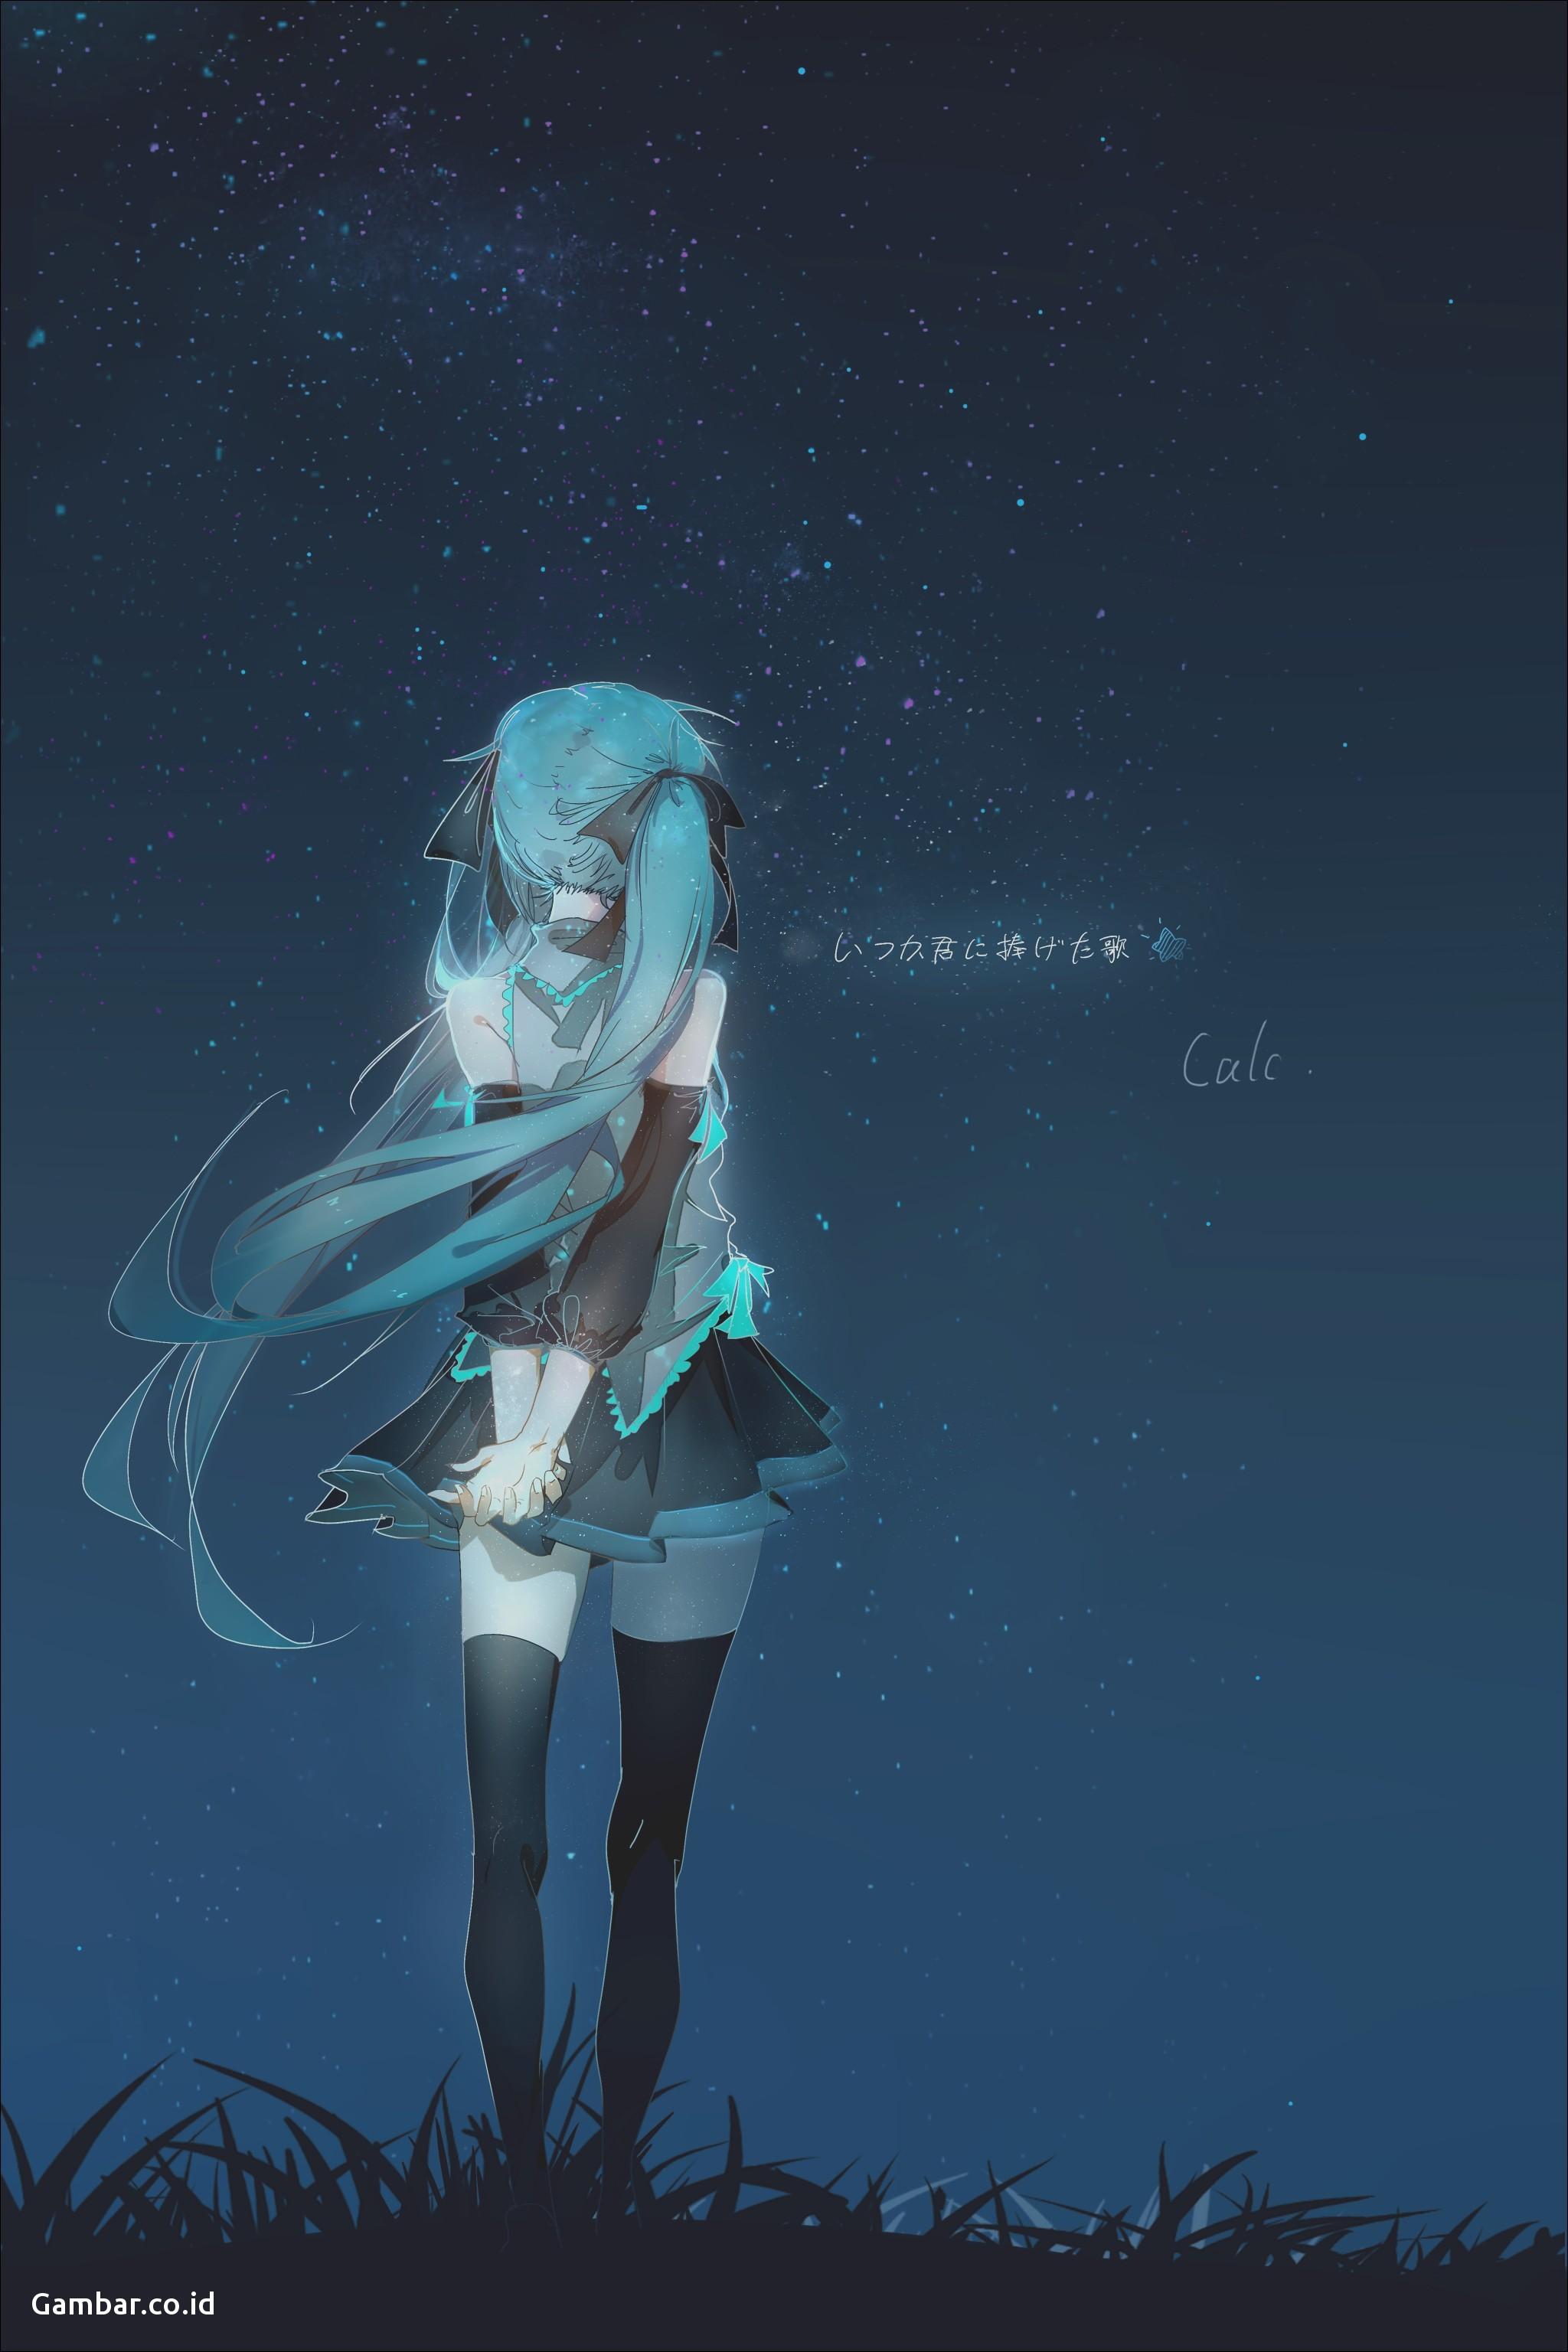 Hatsune Hatsune Miku Calc 391298 Hd Wallpaper Backgrounds